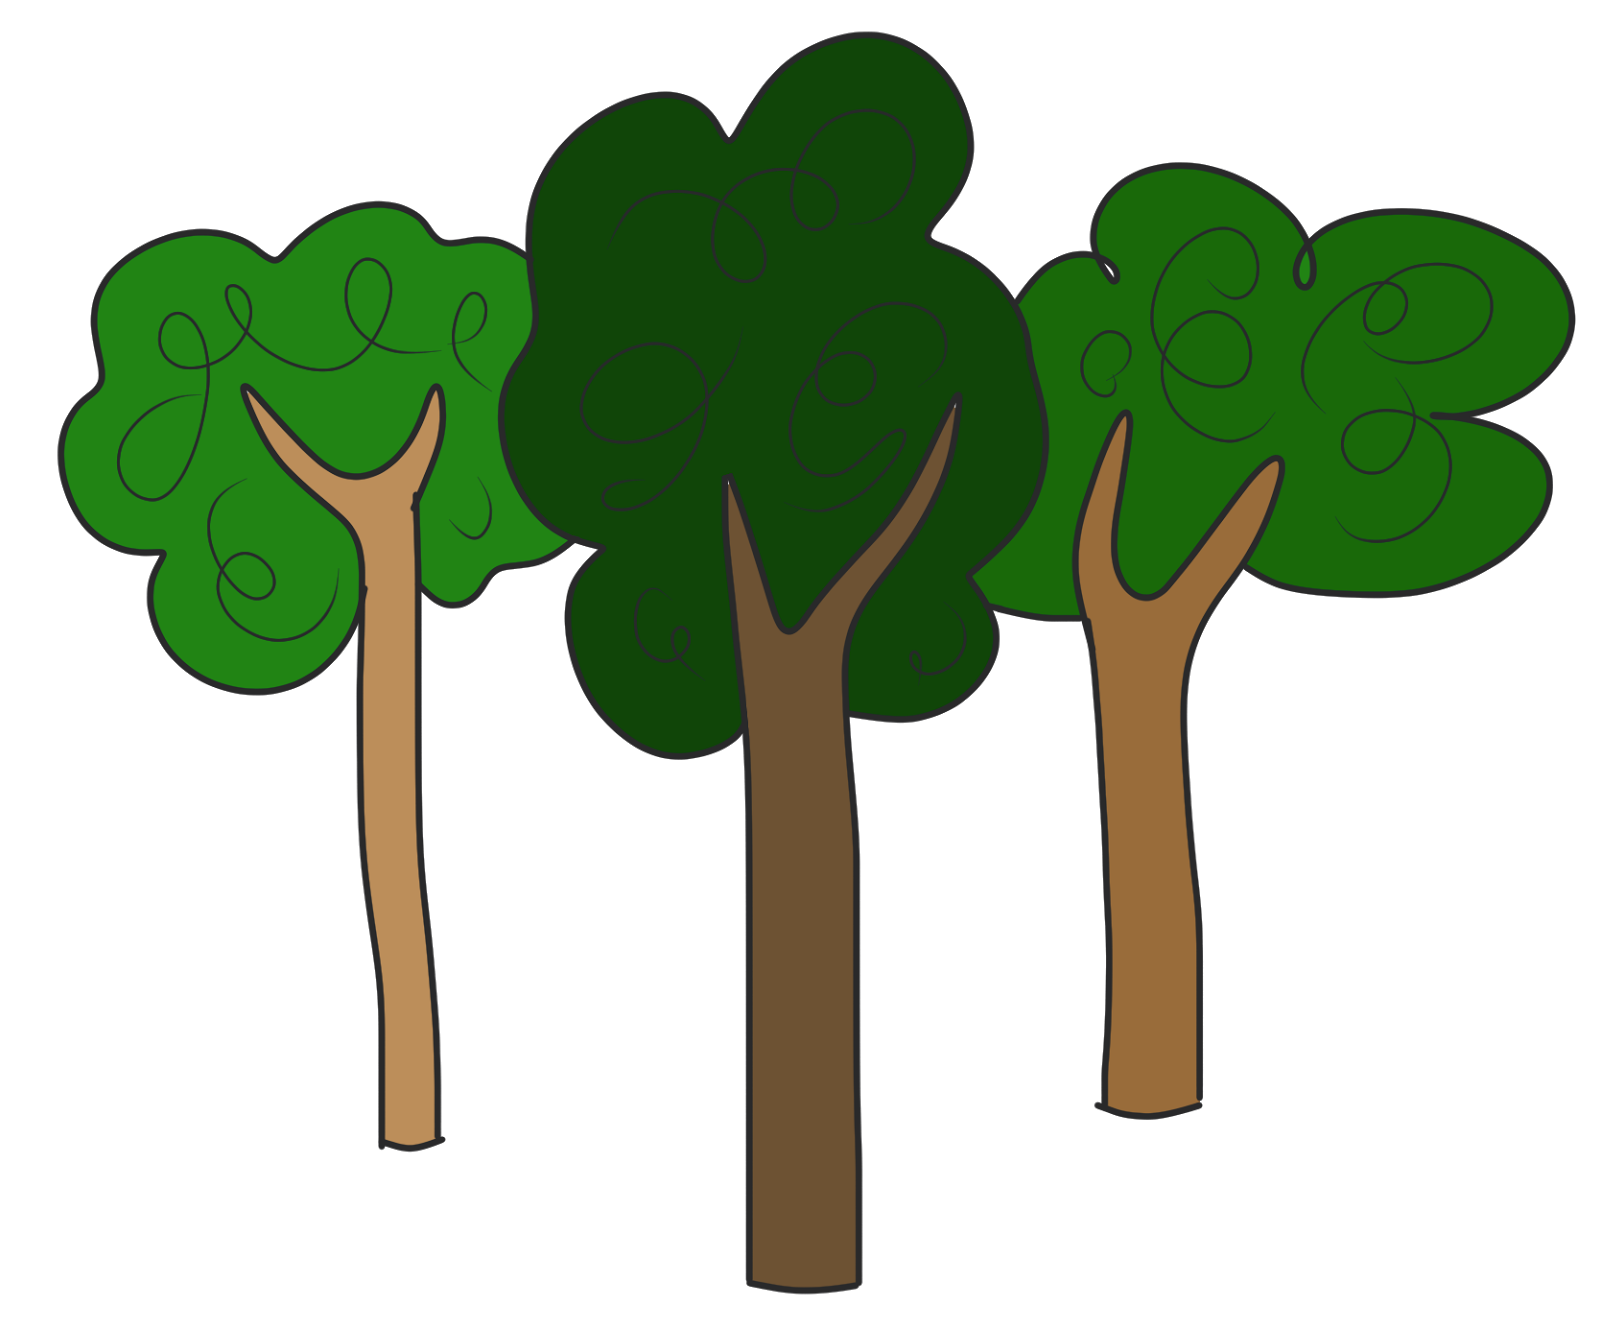 Clipart Trees Clipart-Clipart trees clipart-4